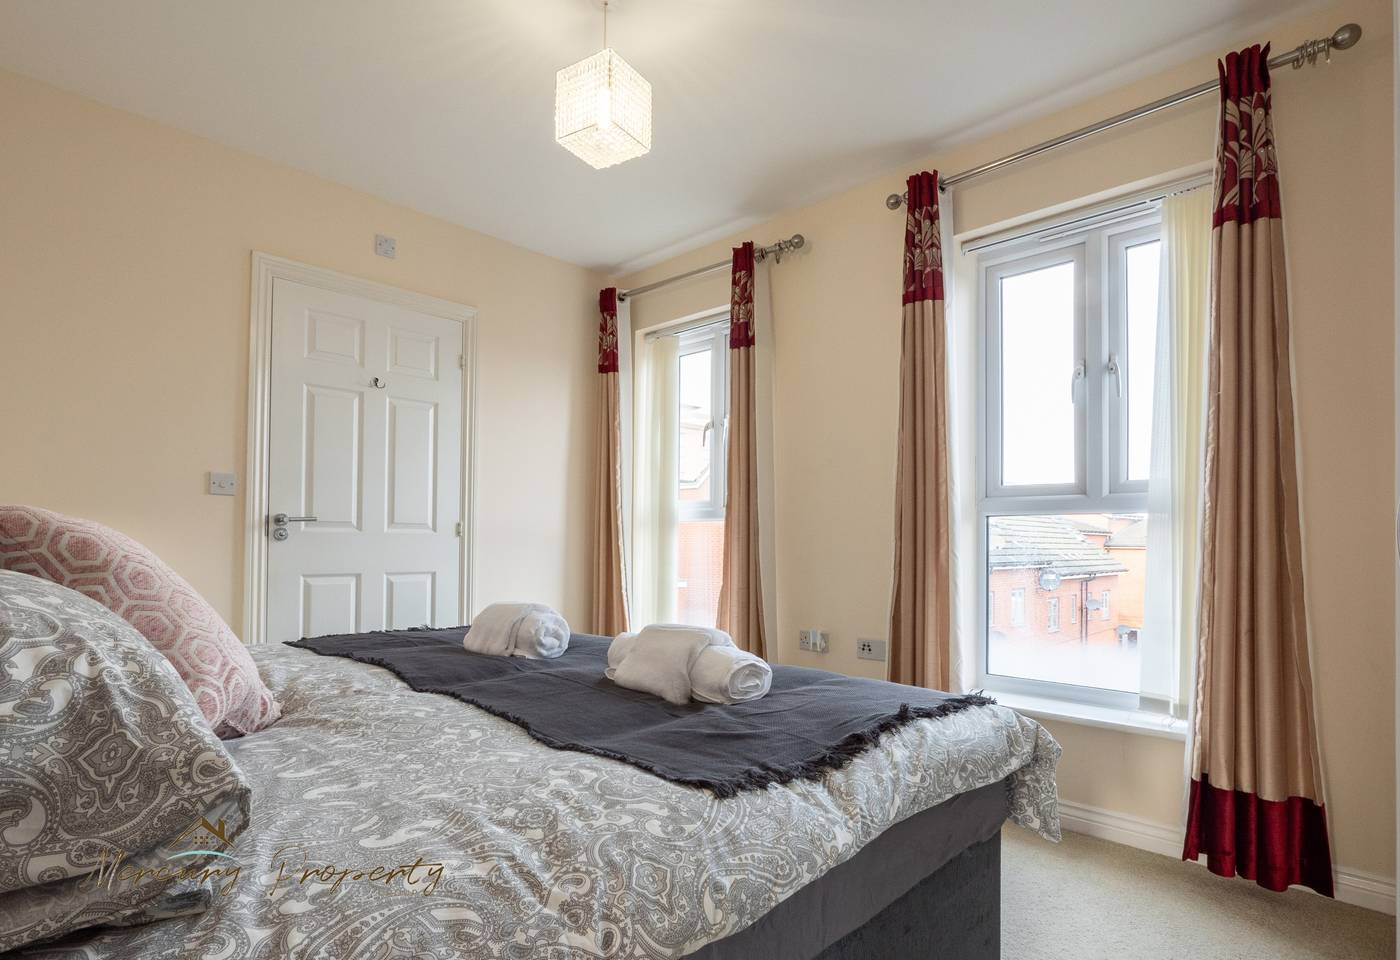 Apartment Ashdown -Bed Apartment Reading Town w  Balcony  5  photo 18441922